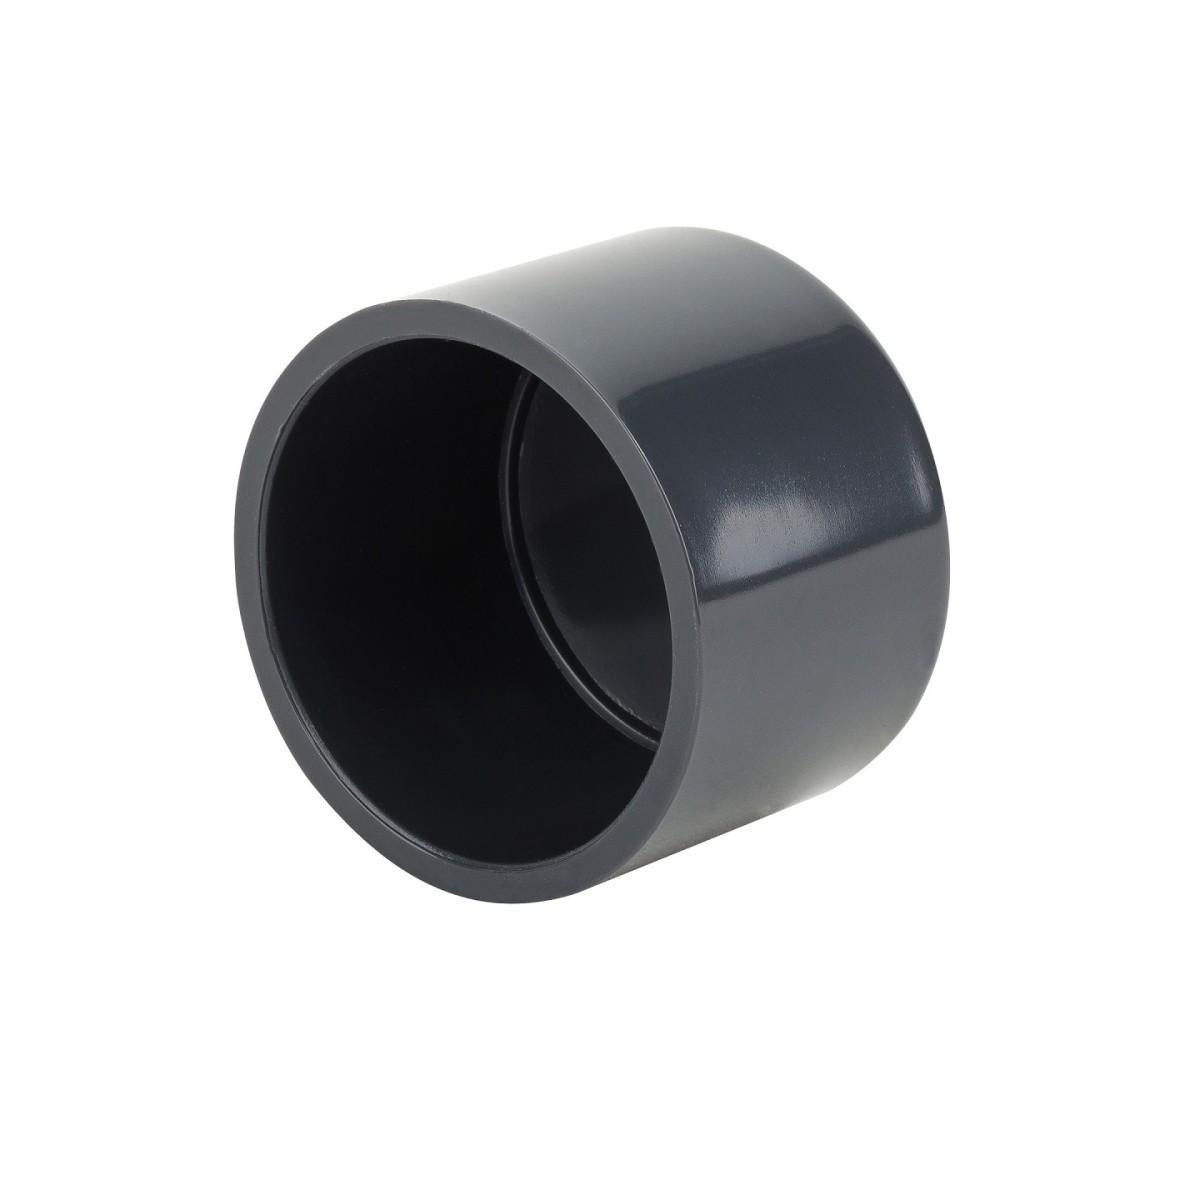 Заглушка ПВХ Aquaviva клеевая, диаметр 75 мм.